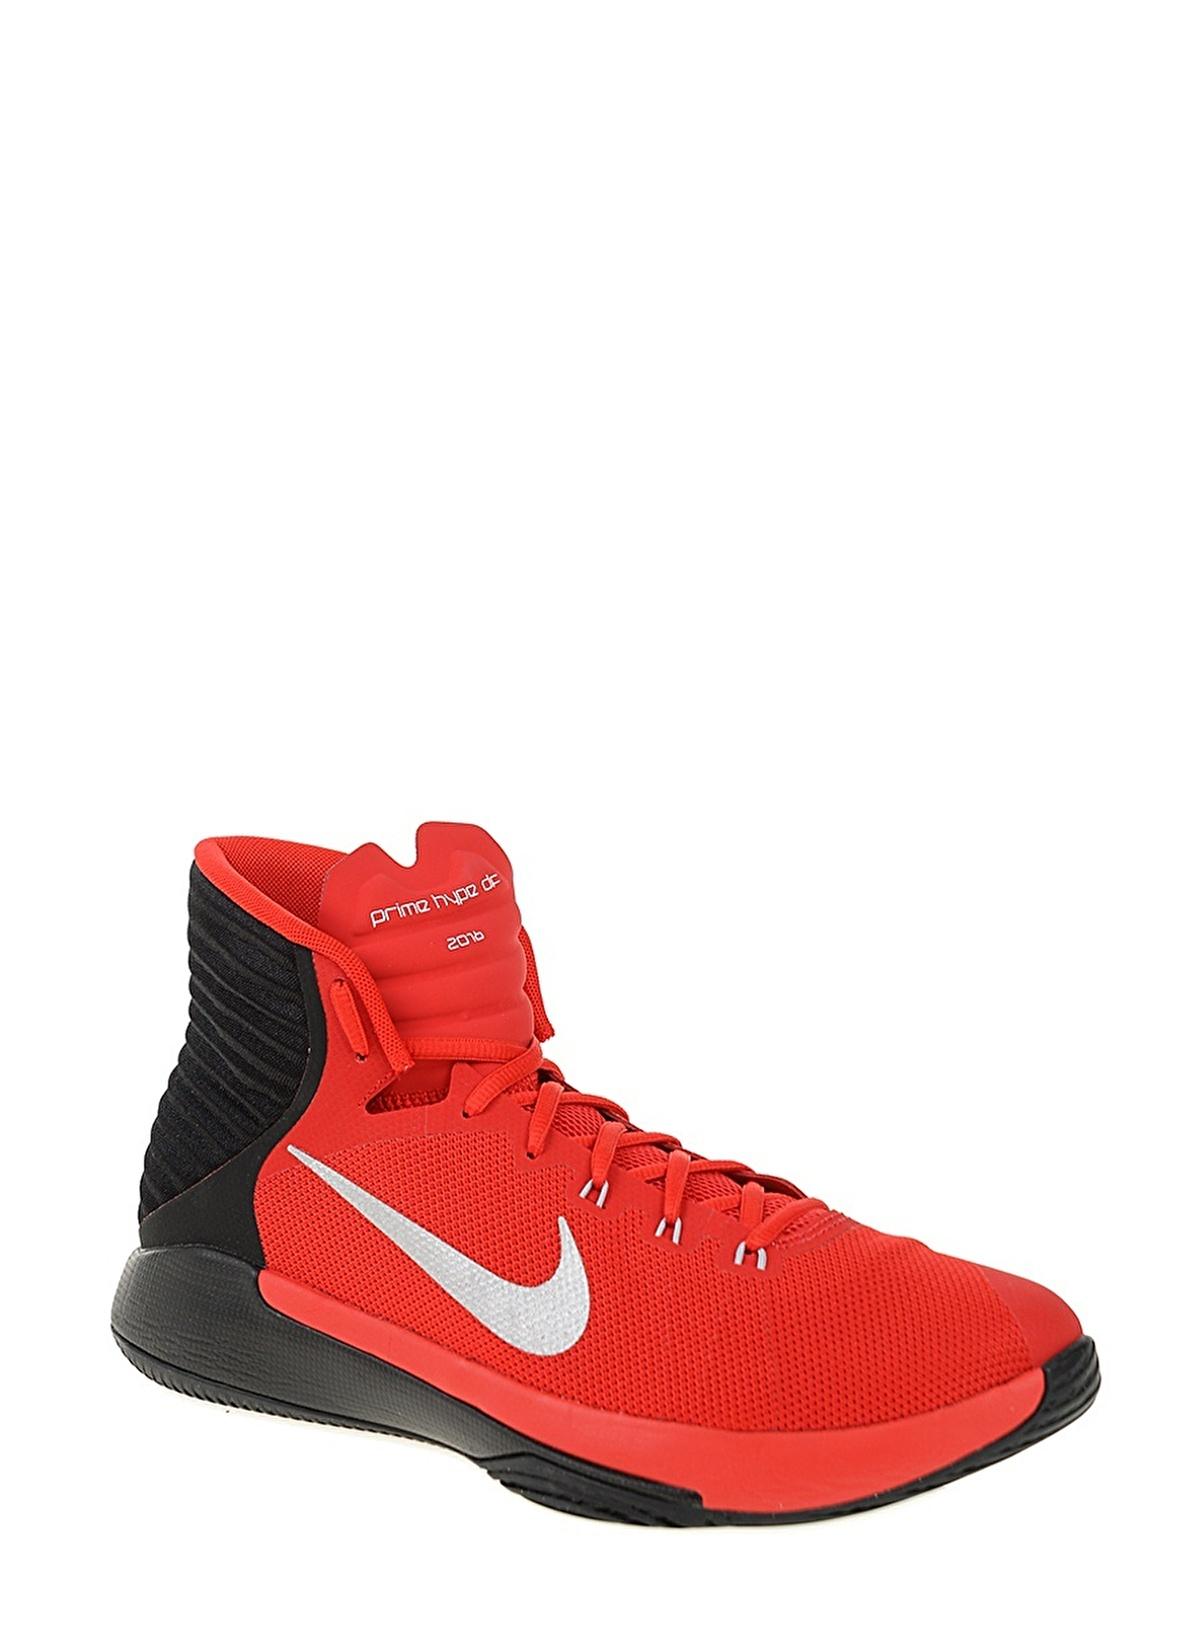 half off c411e df011 844787-600-Nike-Prime-Hype-Df-2016